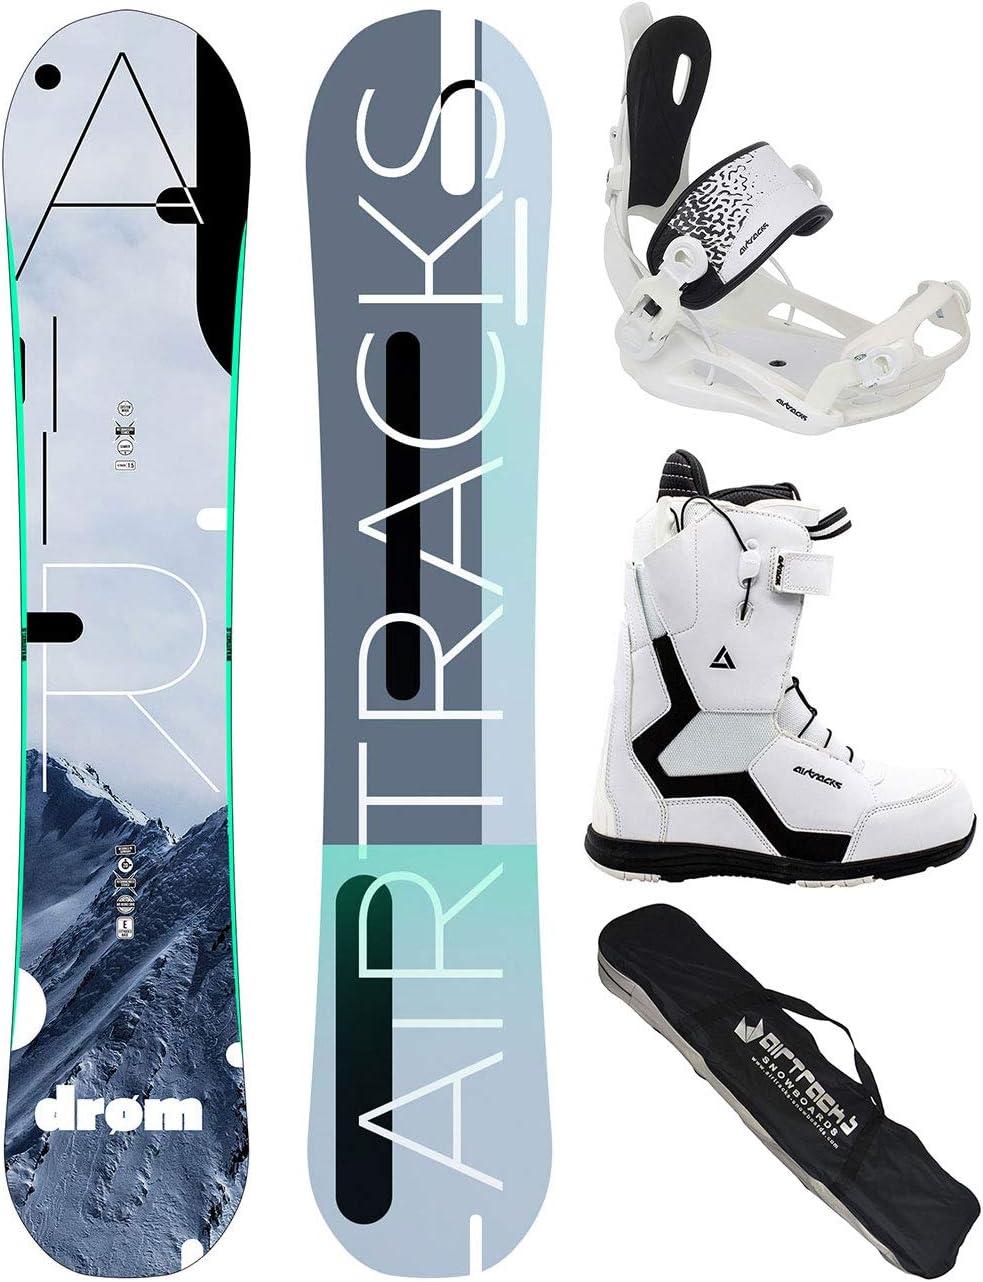 Airtracks Snowboard Set TAVOLA Data Wide Uomo+ATTACCHI Master FASTEC+Scarponi+Sacca//Nuovi